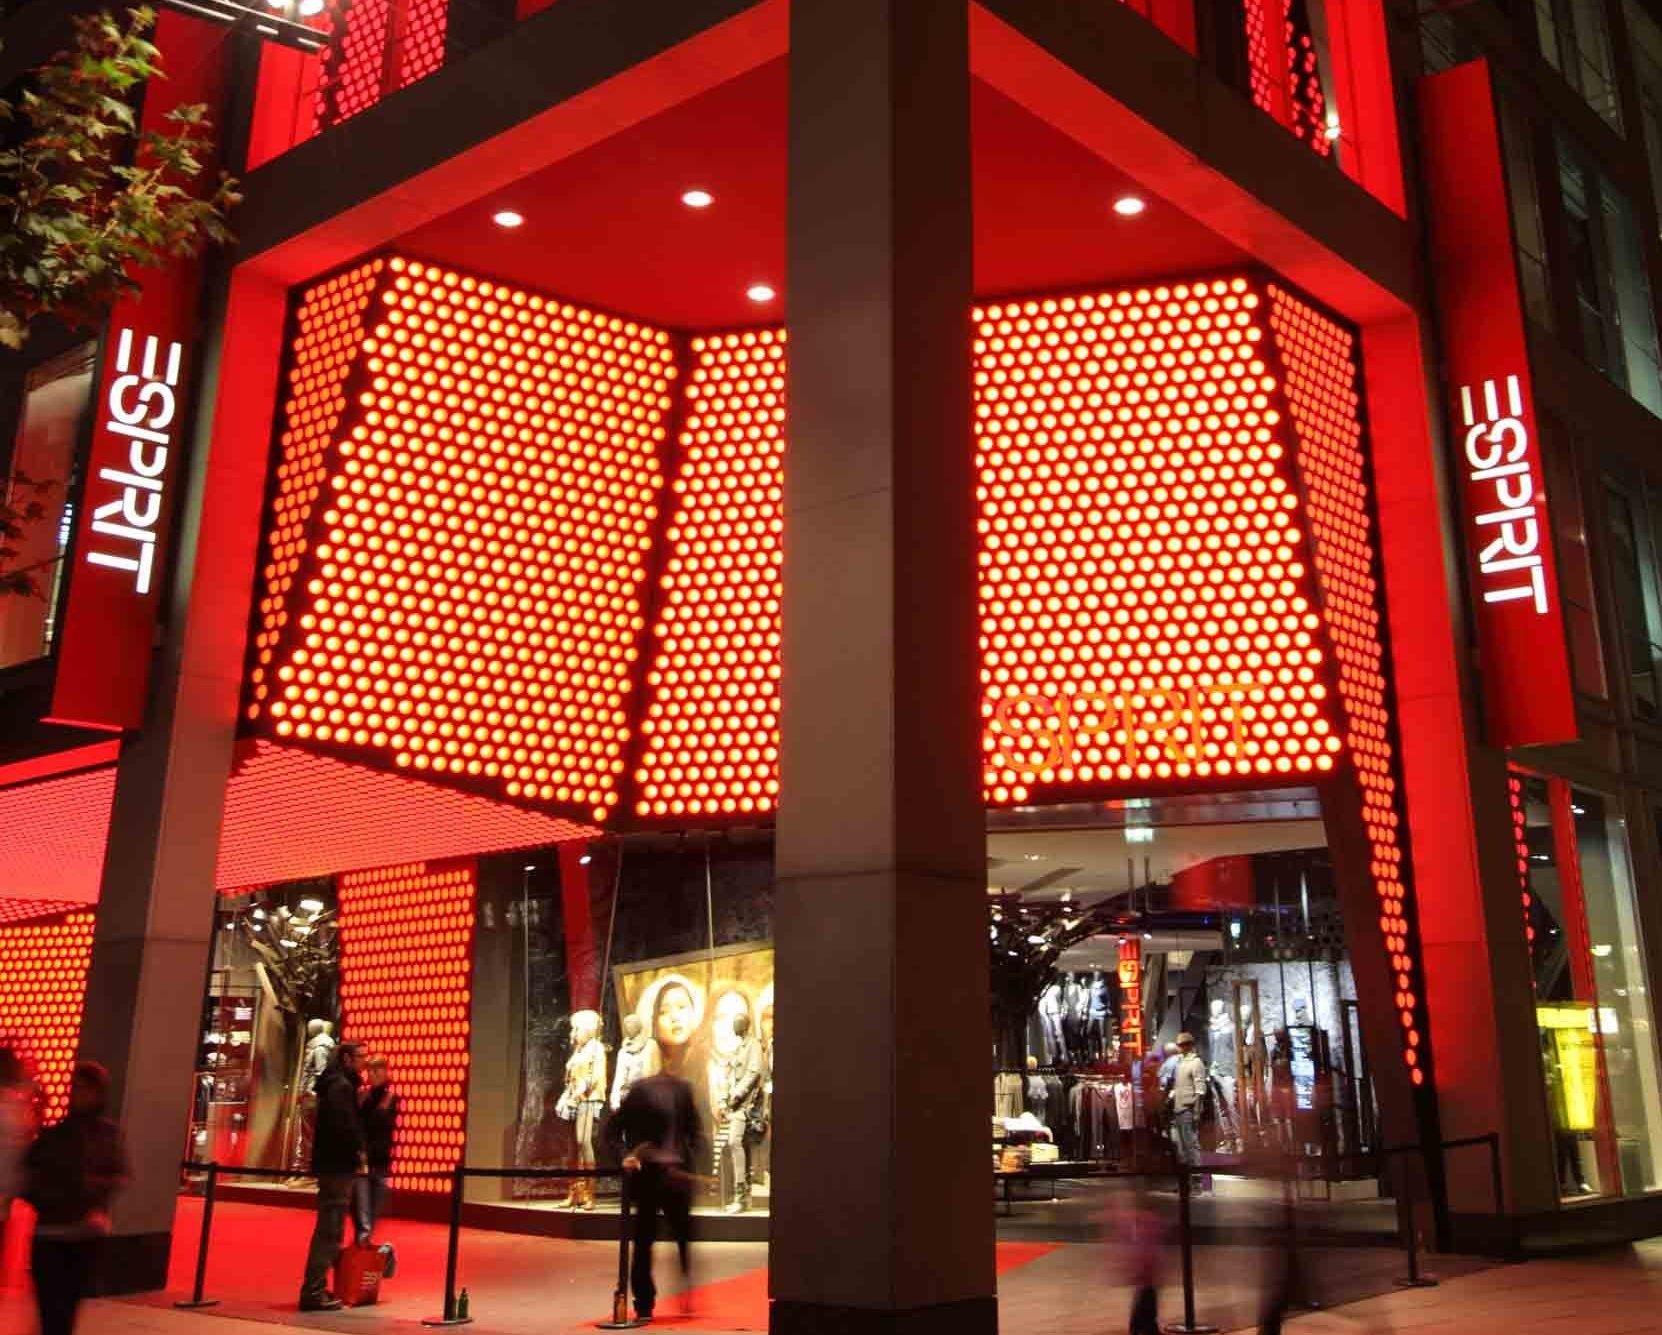 unternehmen esprit er ffnet gr ten store in frankfurt. Black Bedroom Furniture Sets. Home Design Ideas